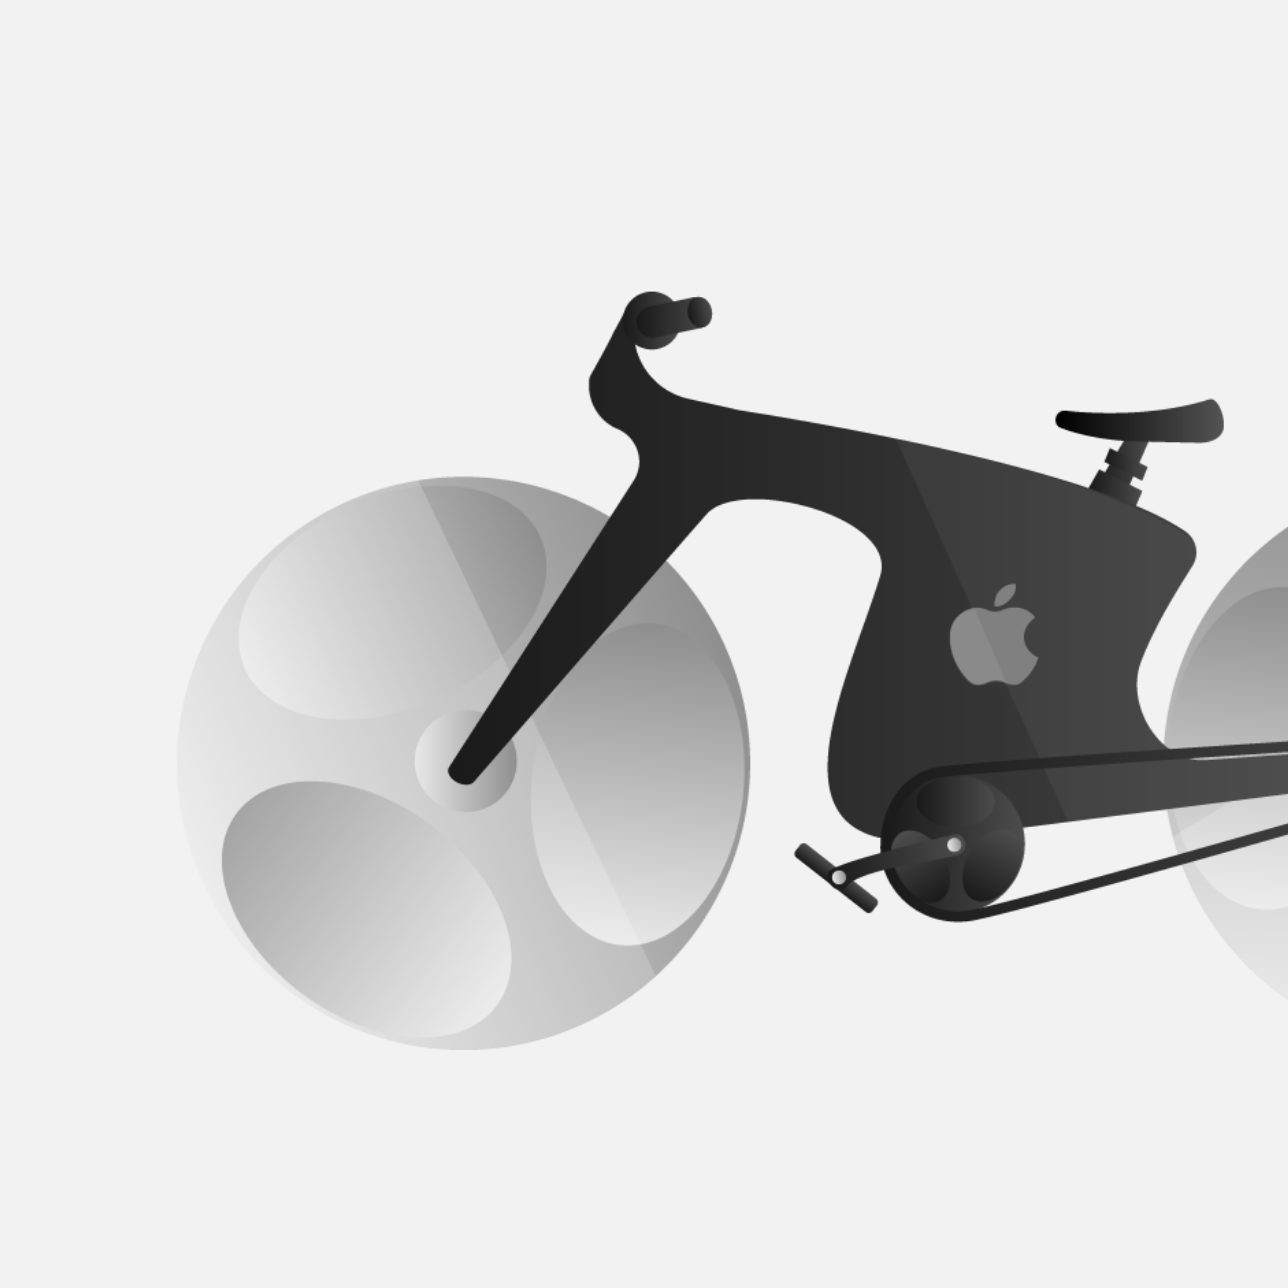 amy-jones-mackeeper-apple-concept-bike-speed-ibike@2x